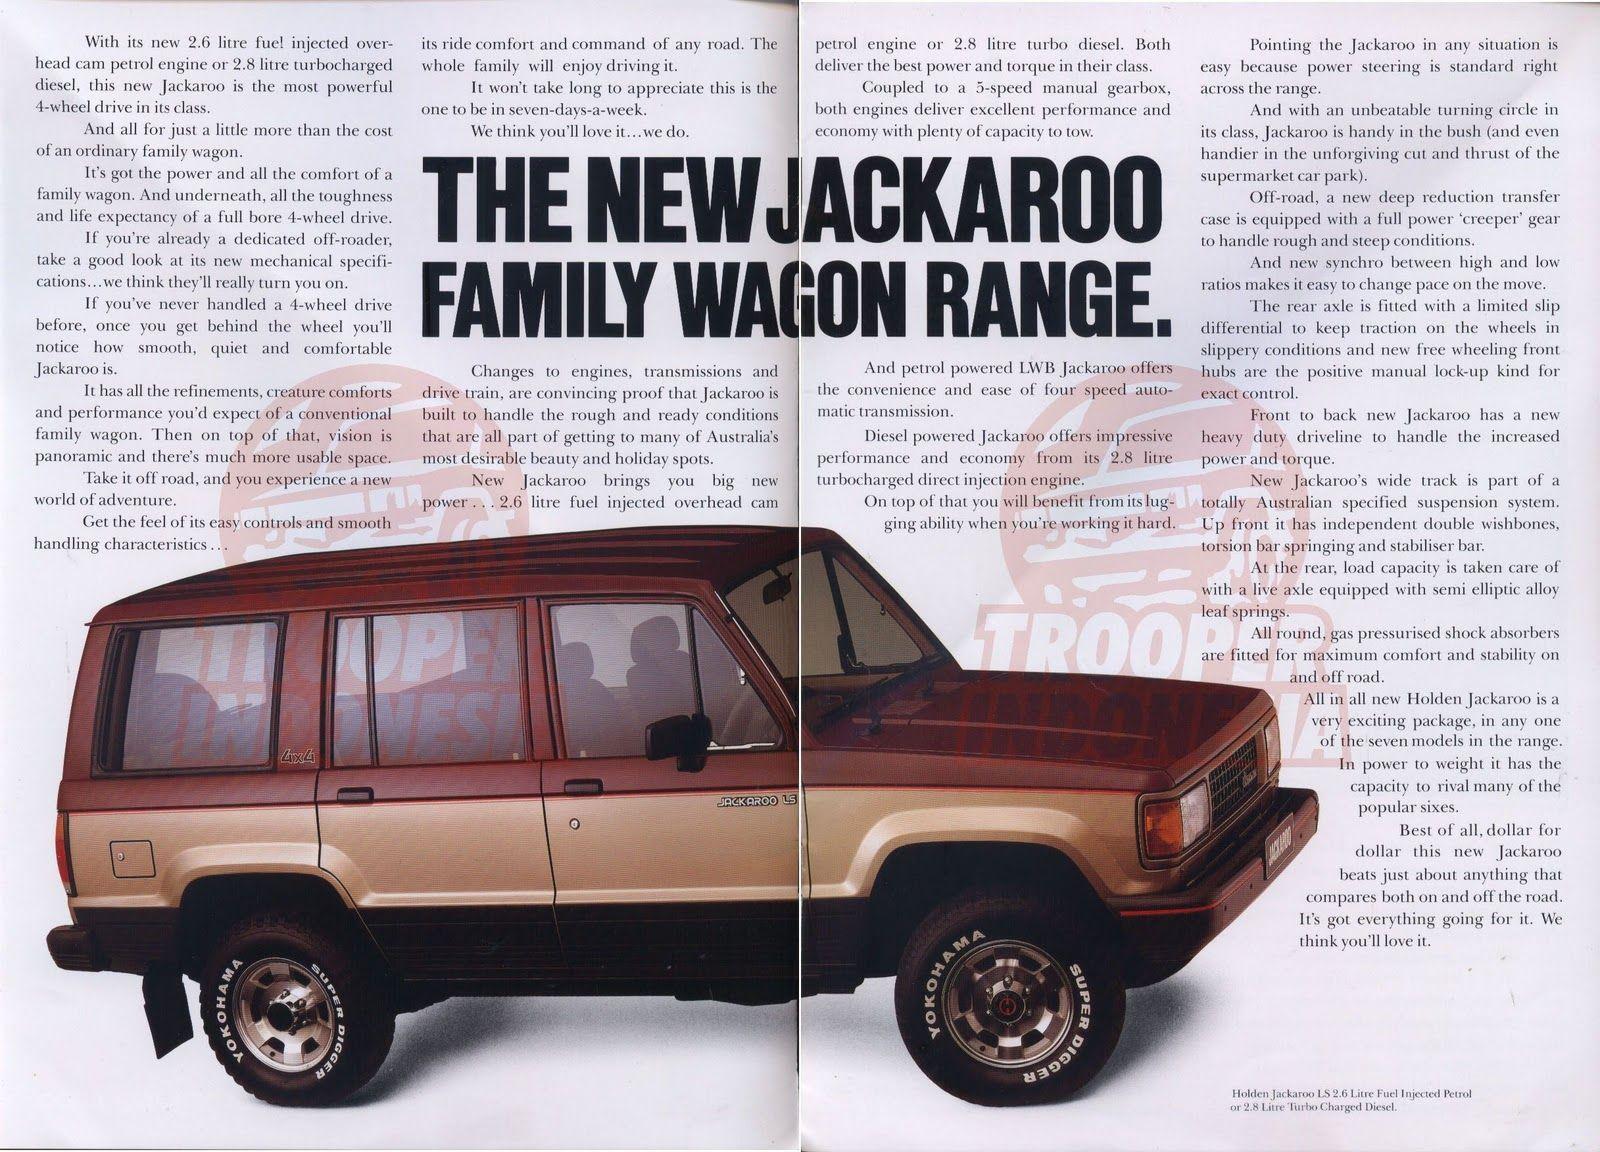 Holden_Jackaroo_1988_p7.jpg